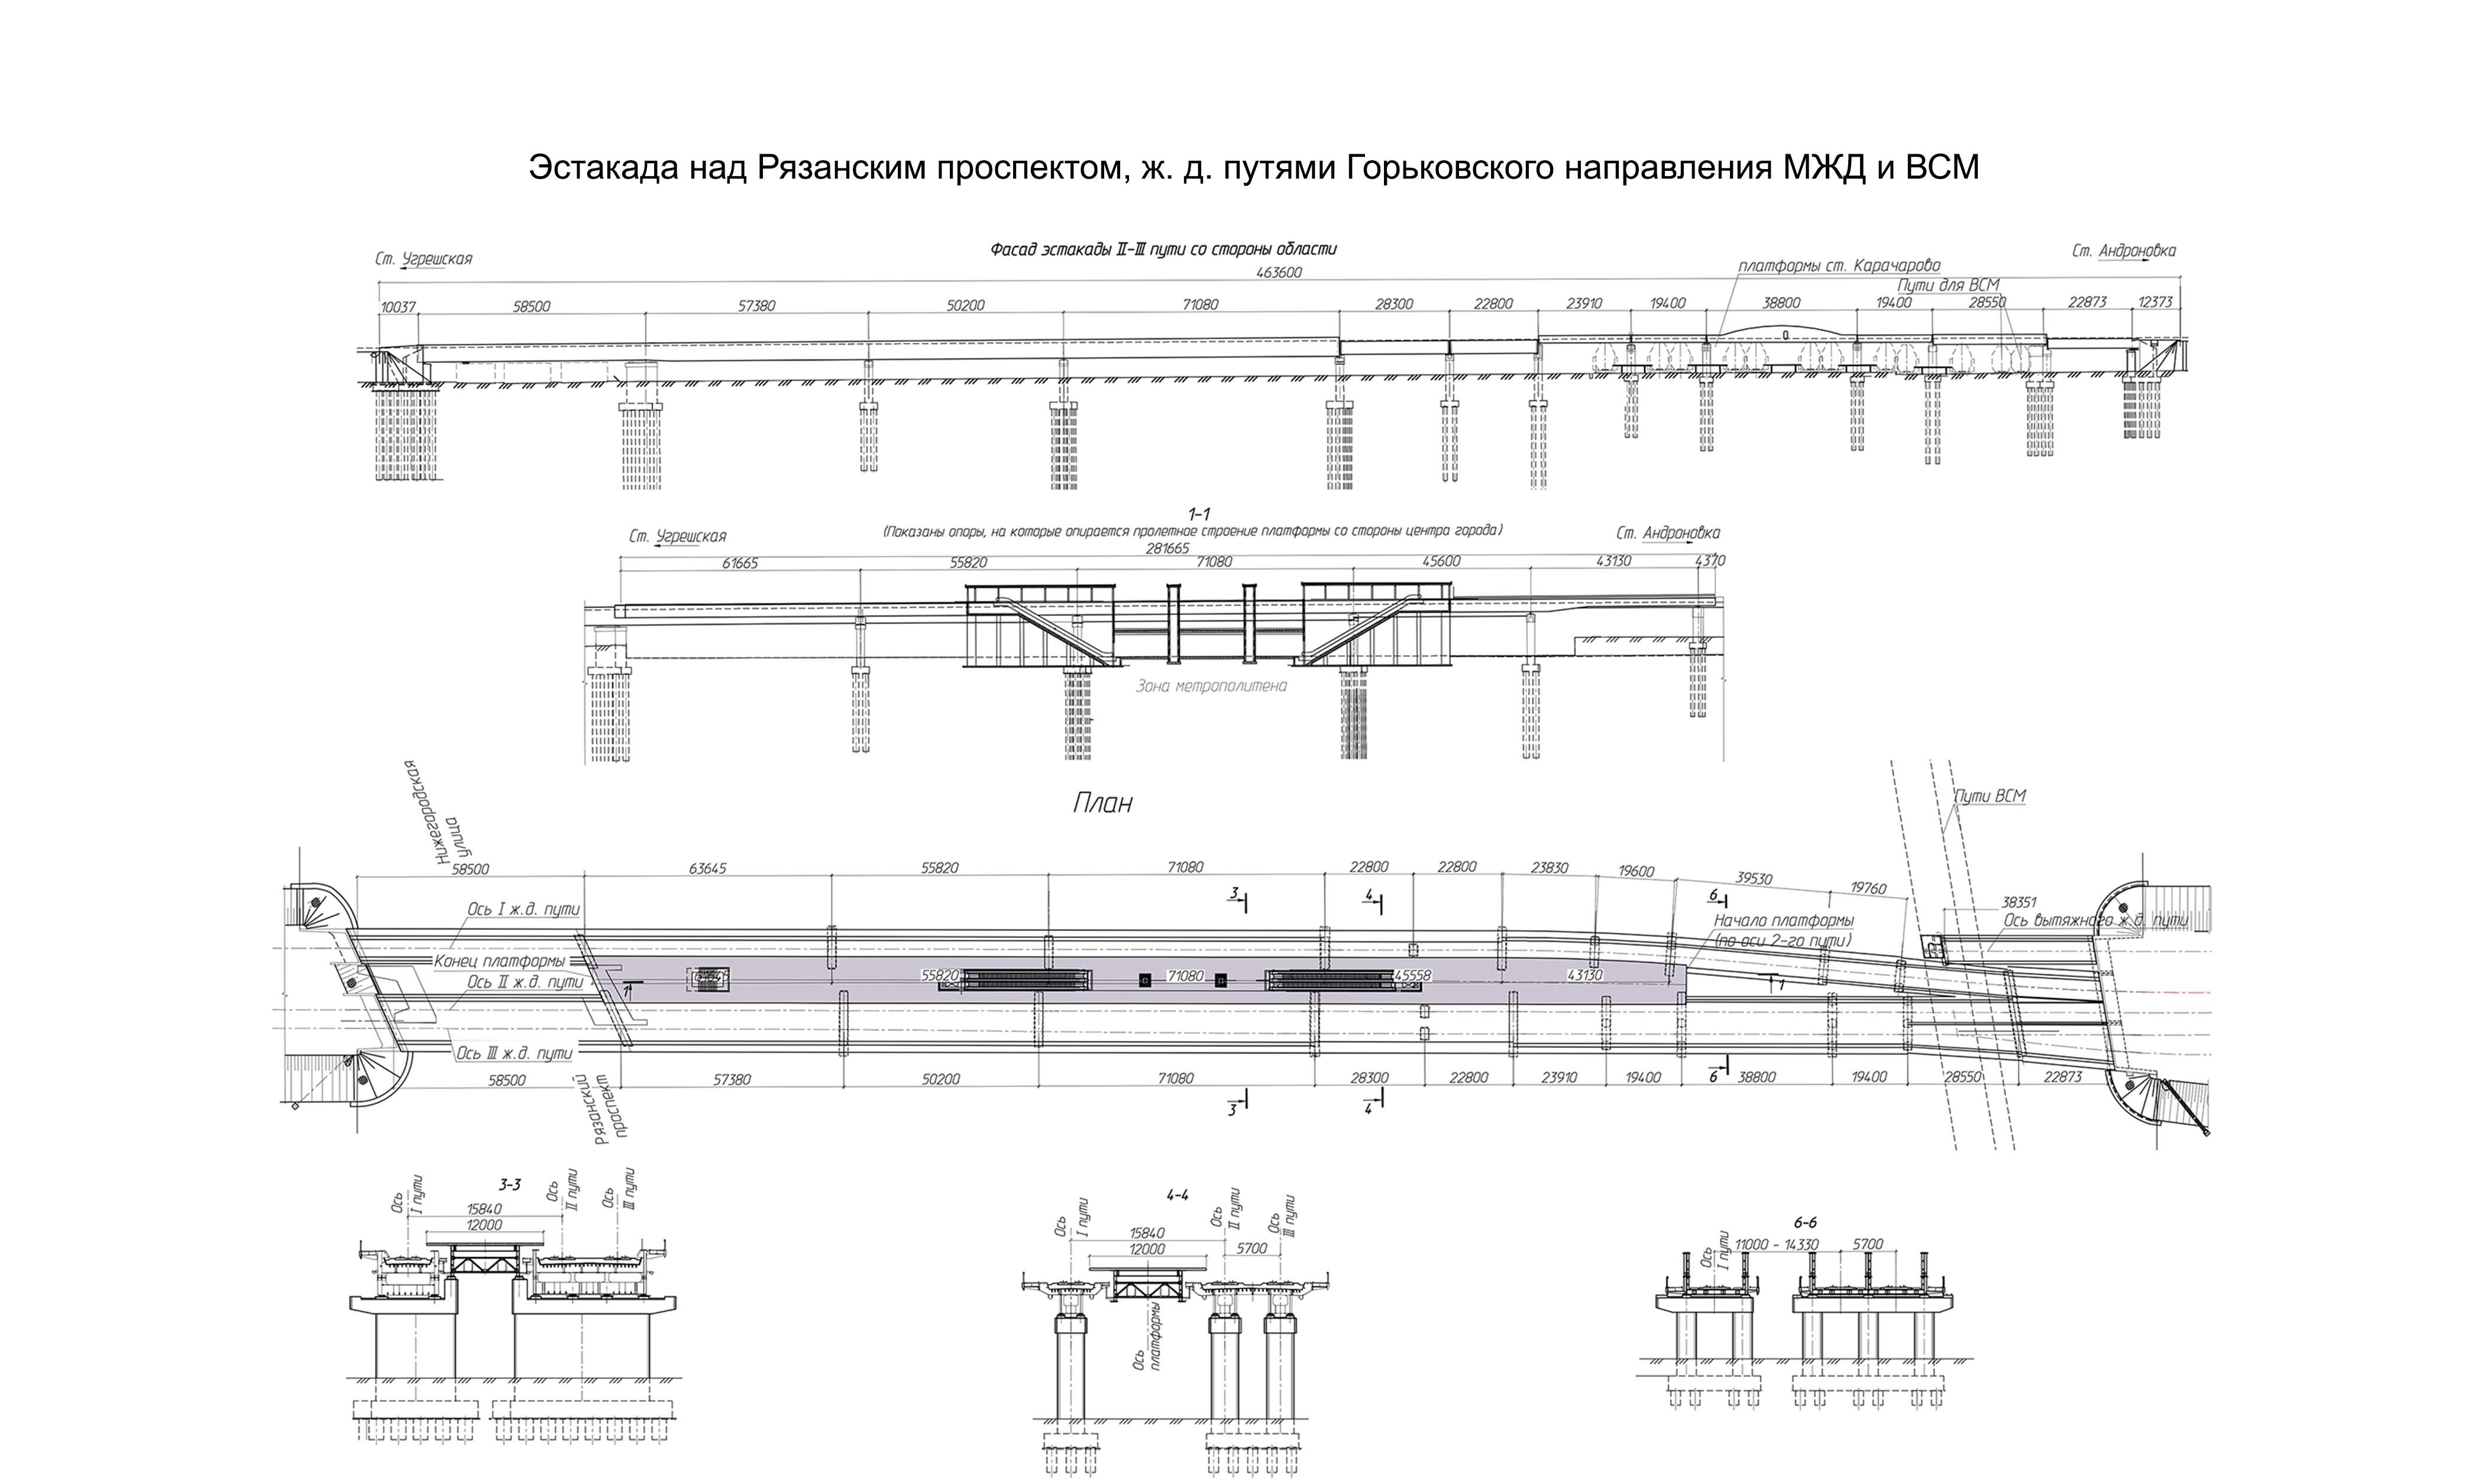 Нижегородская чертеж.jpg